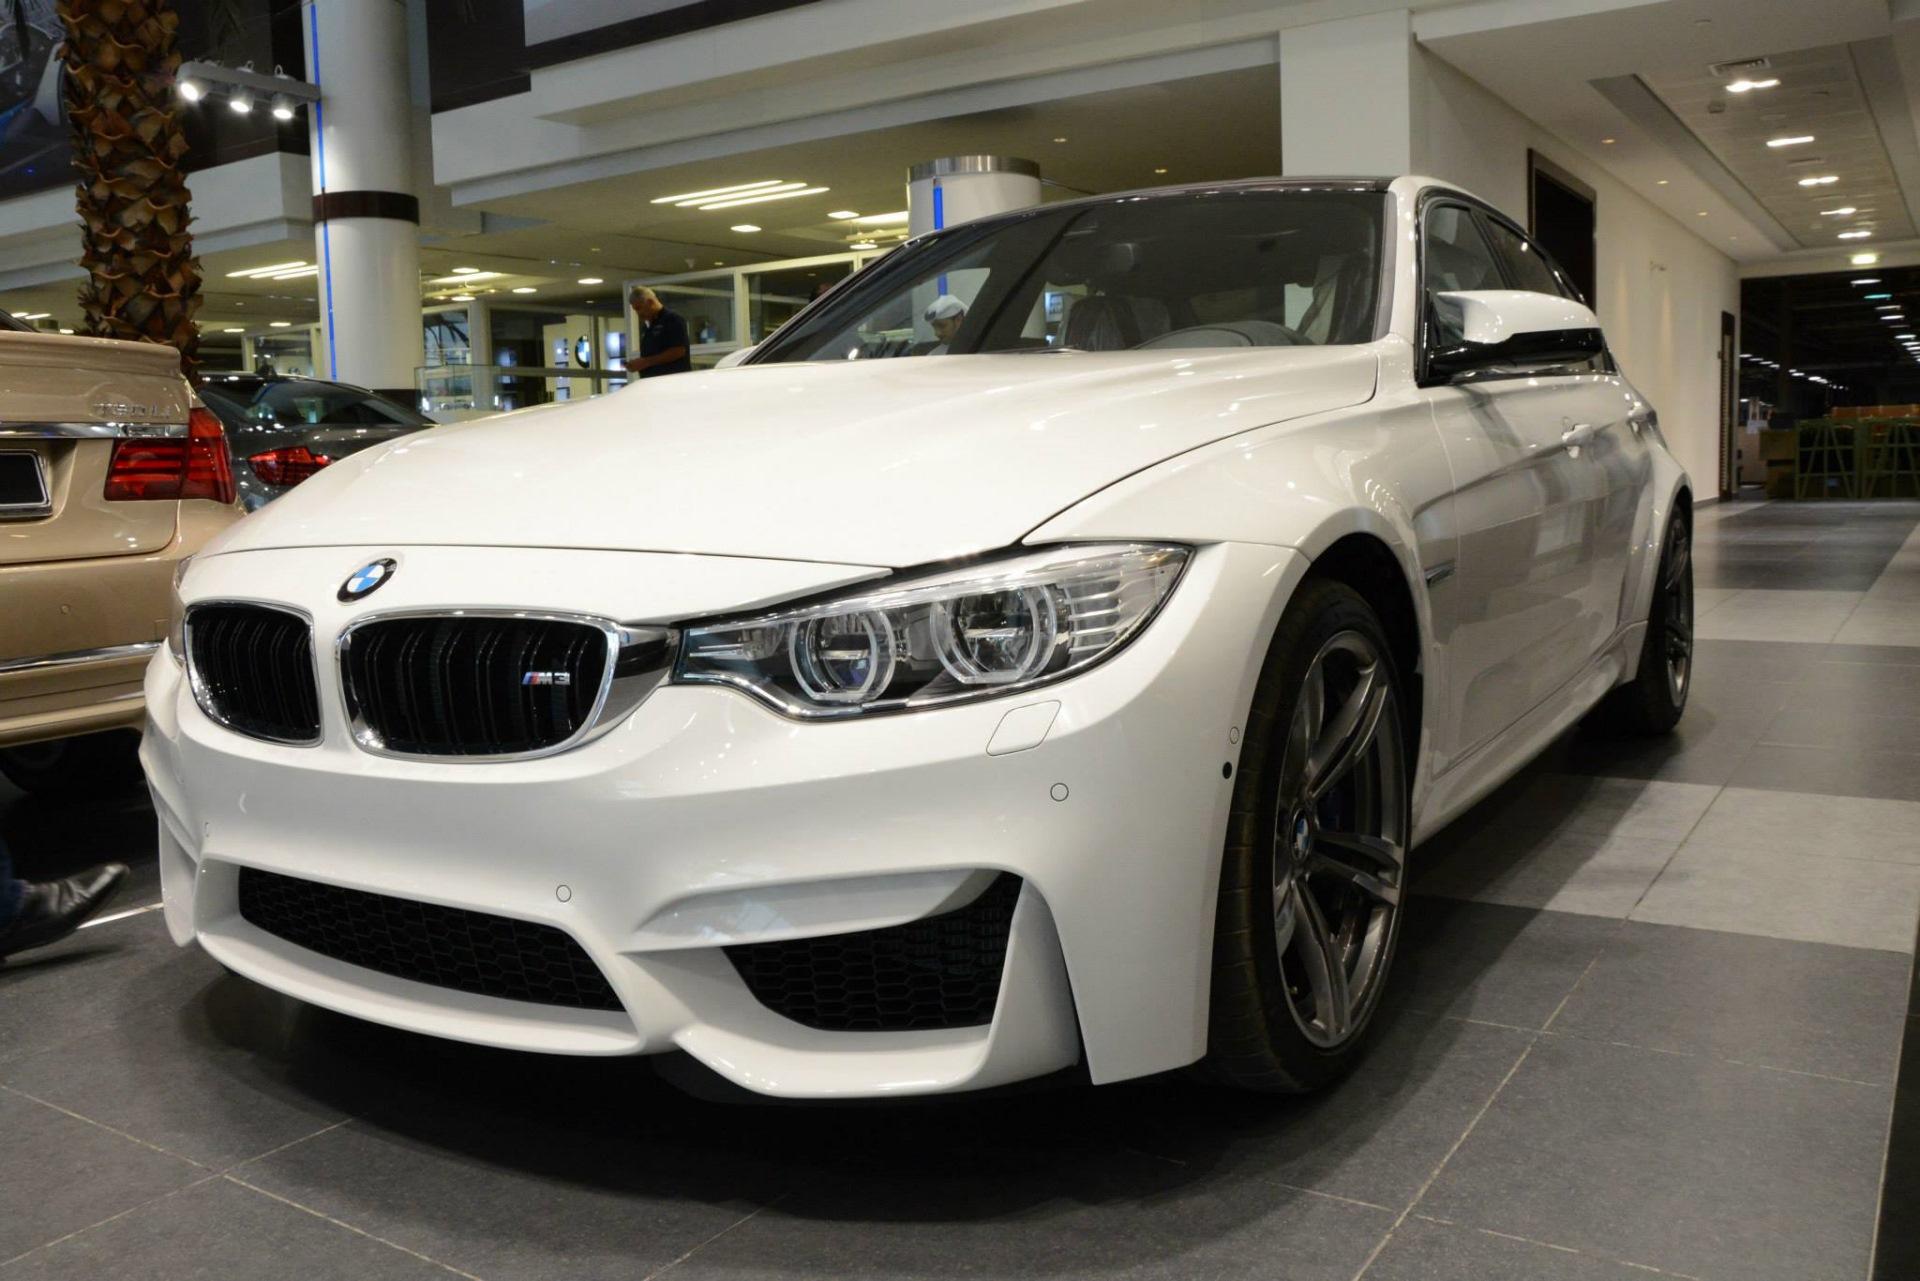 F80 BMW M3 in Alpine White at Abu Dhabi Motors